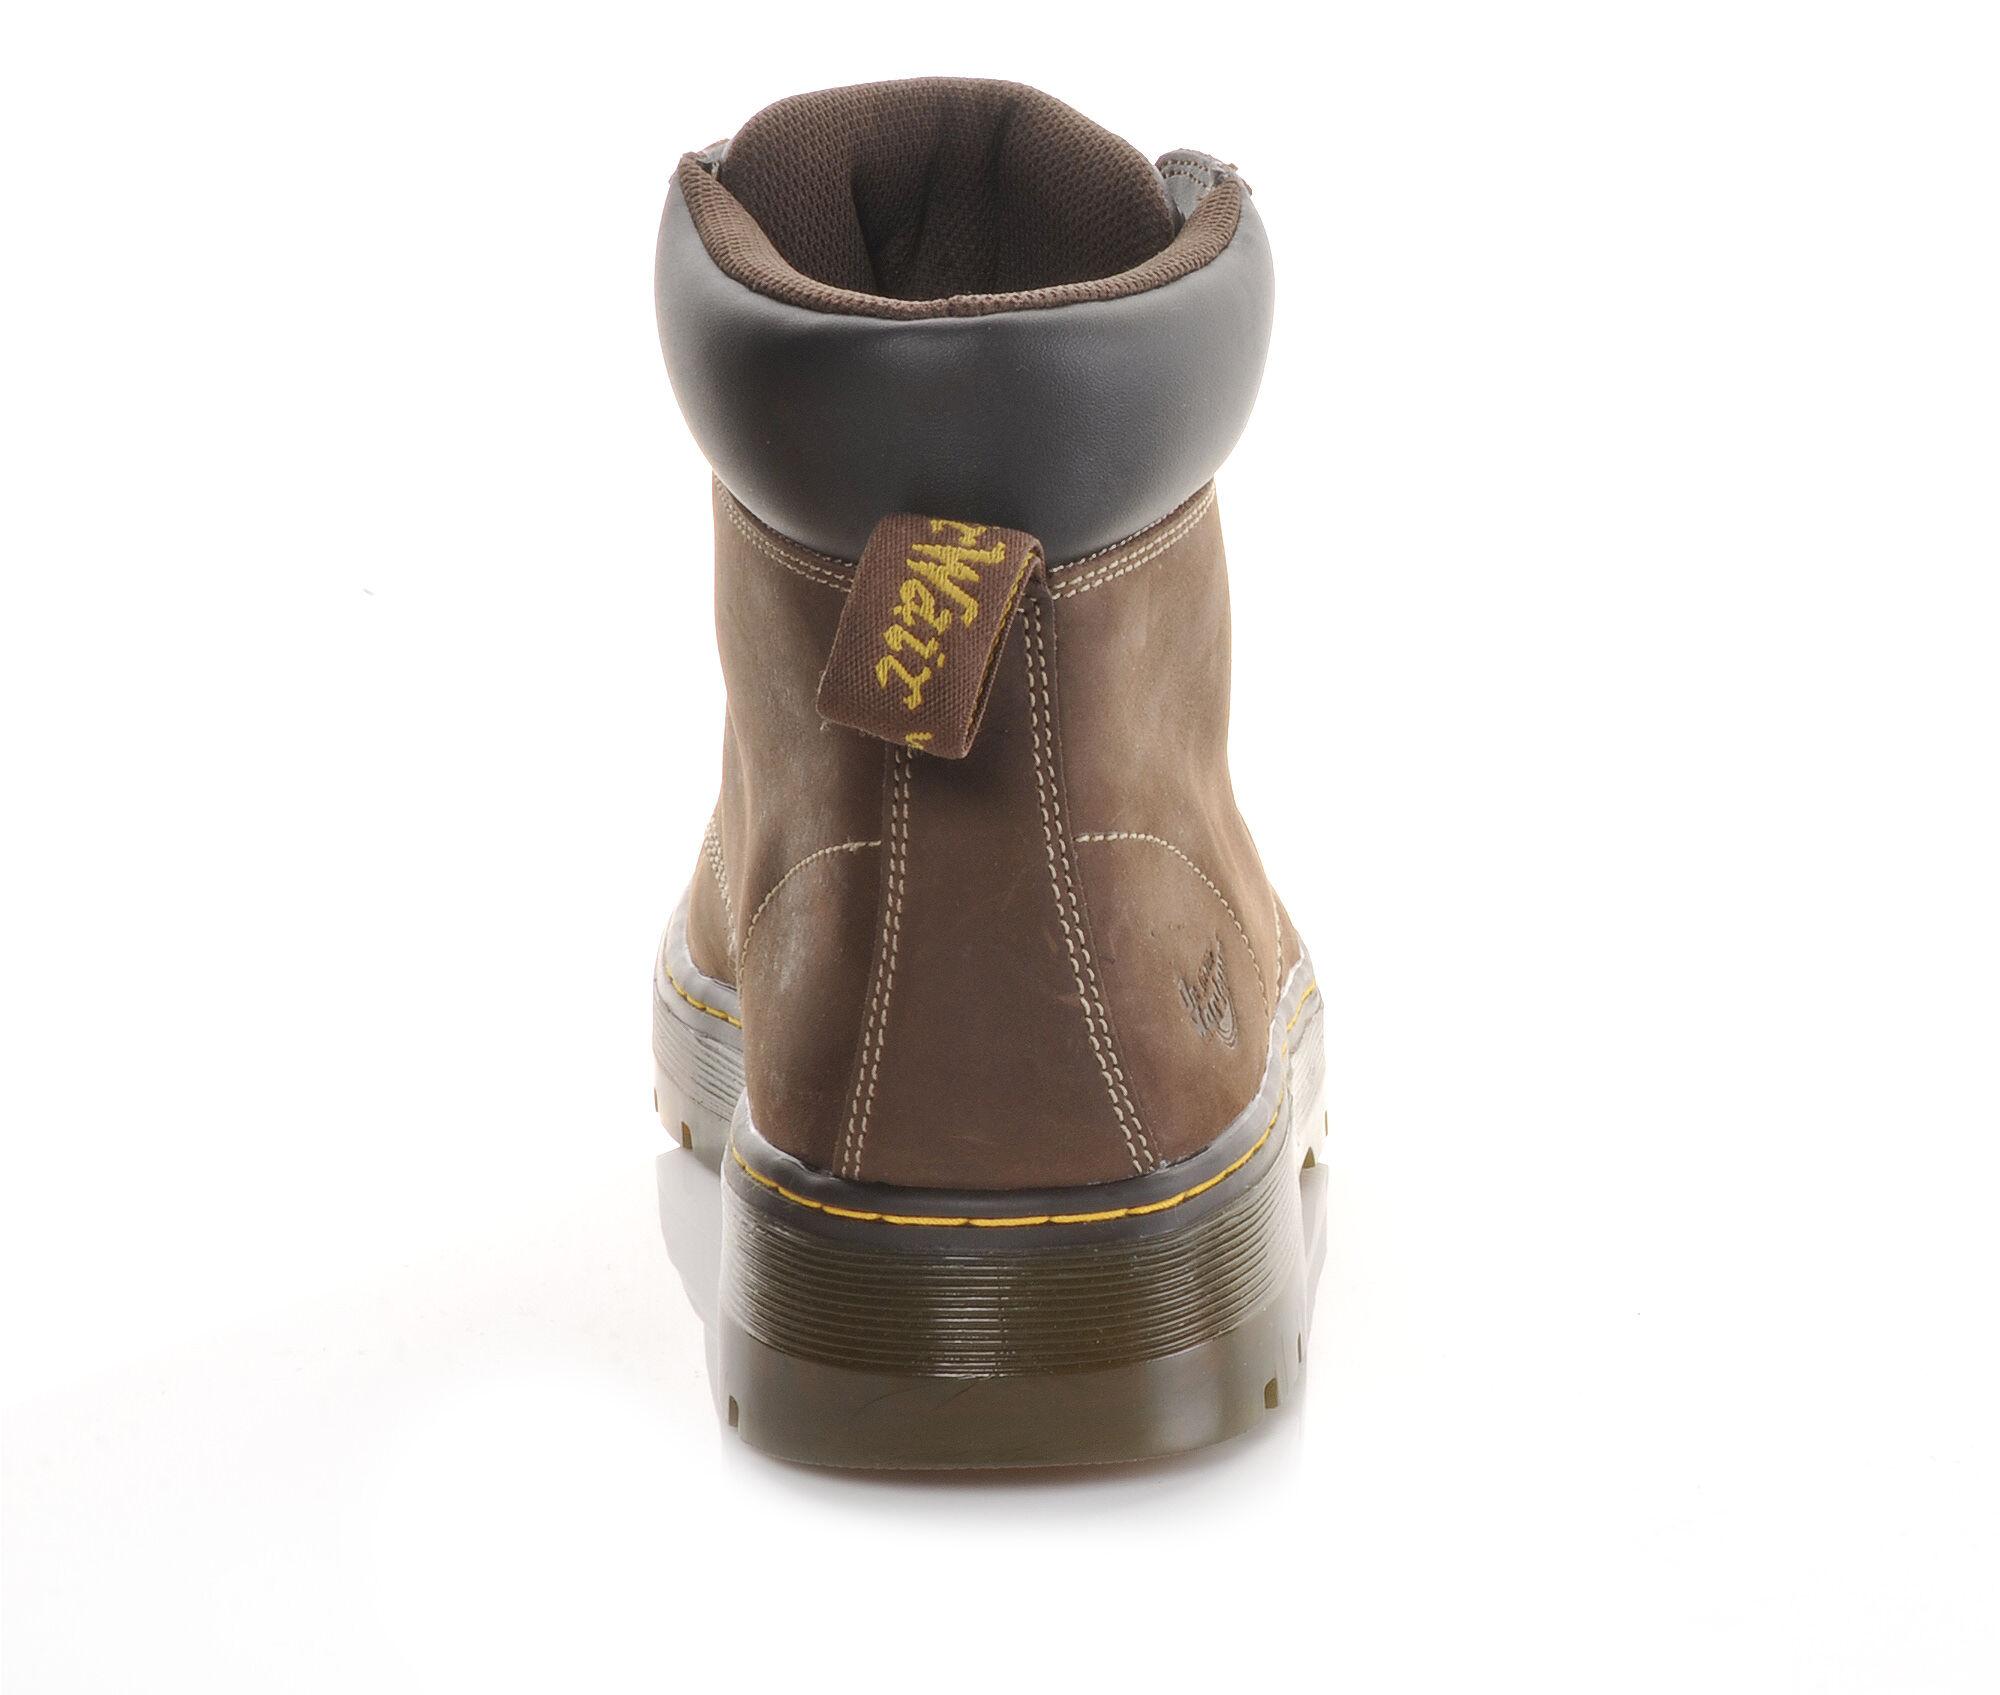 Men's Dr. Martens Industrial Winch Steel Toe Work Boots